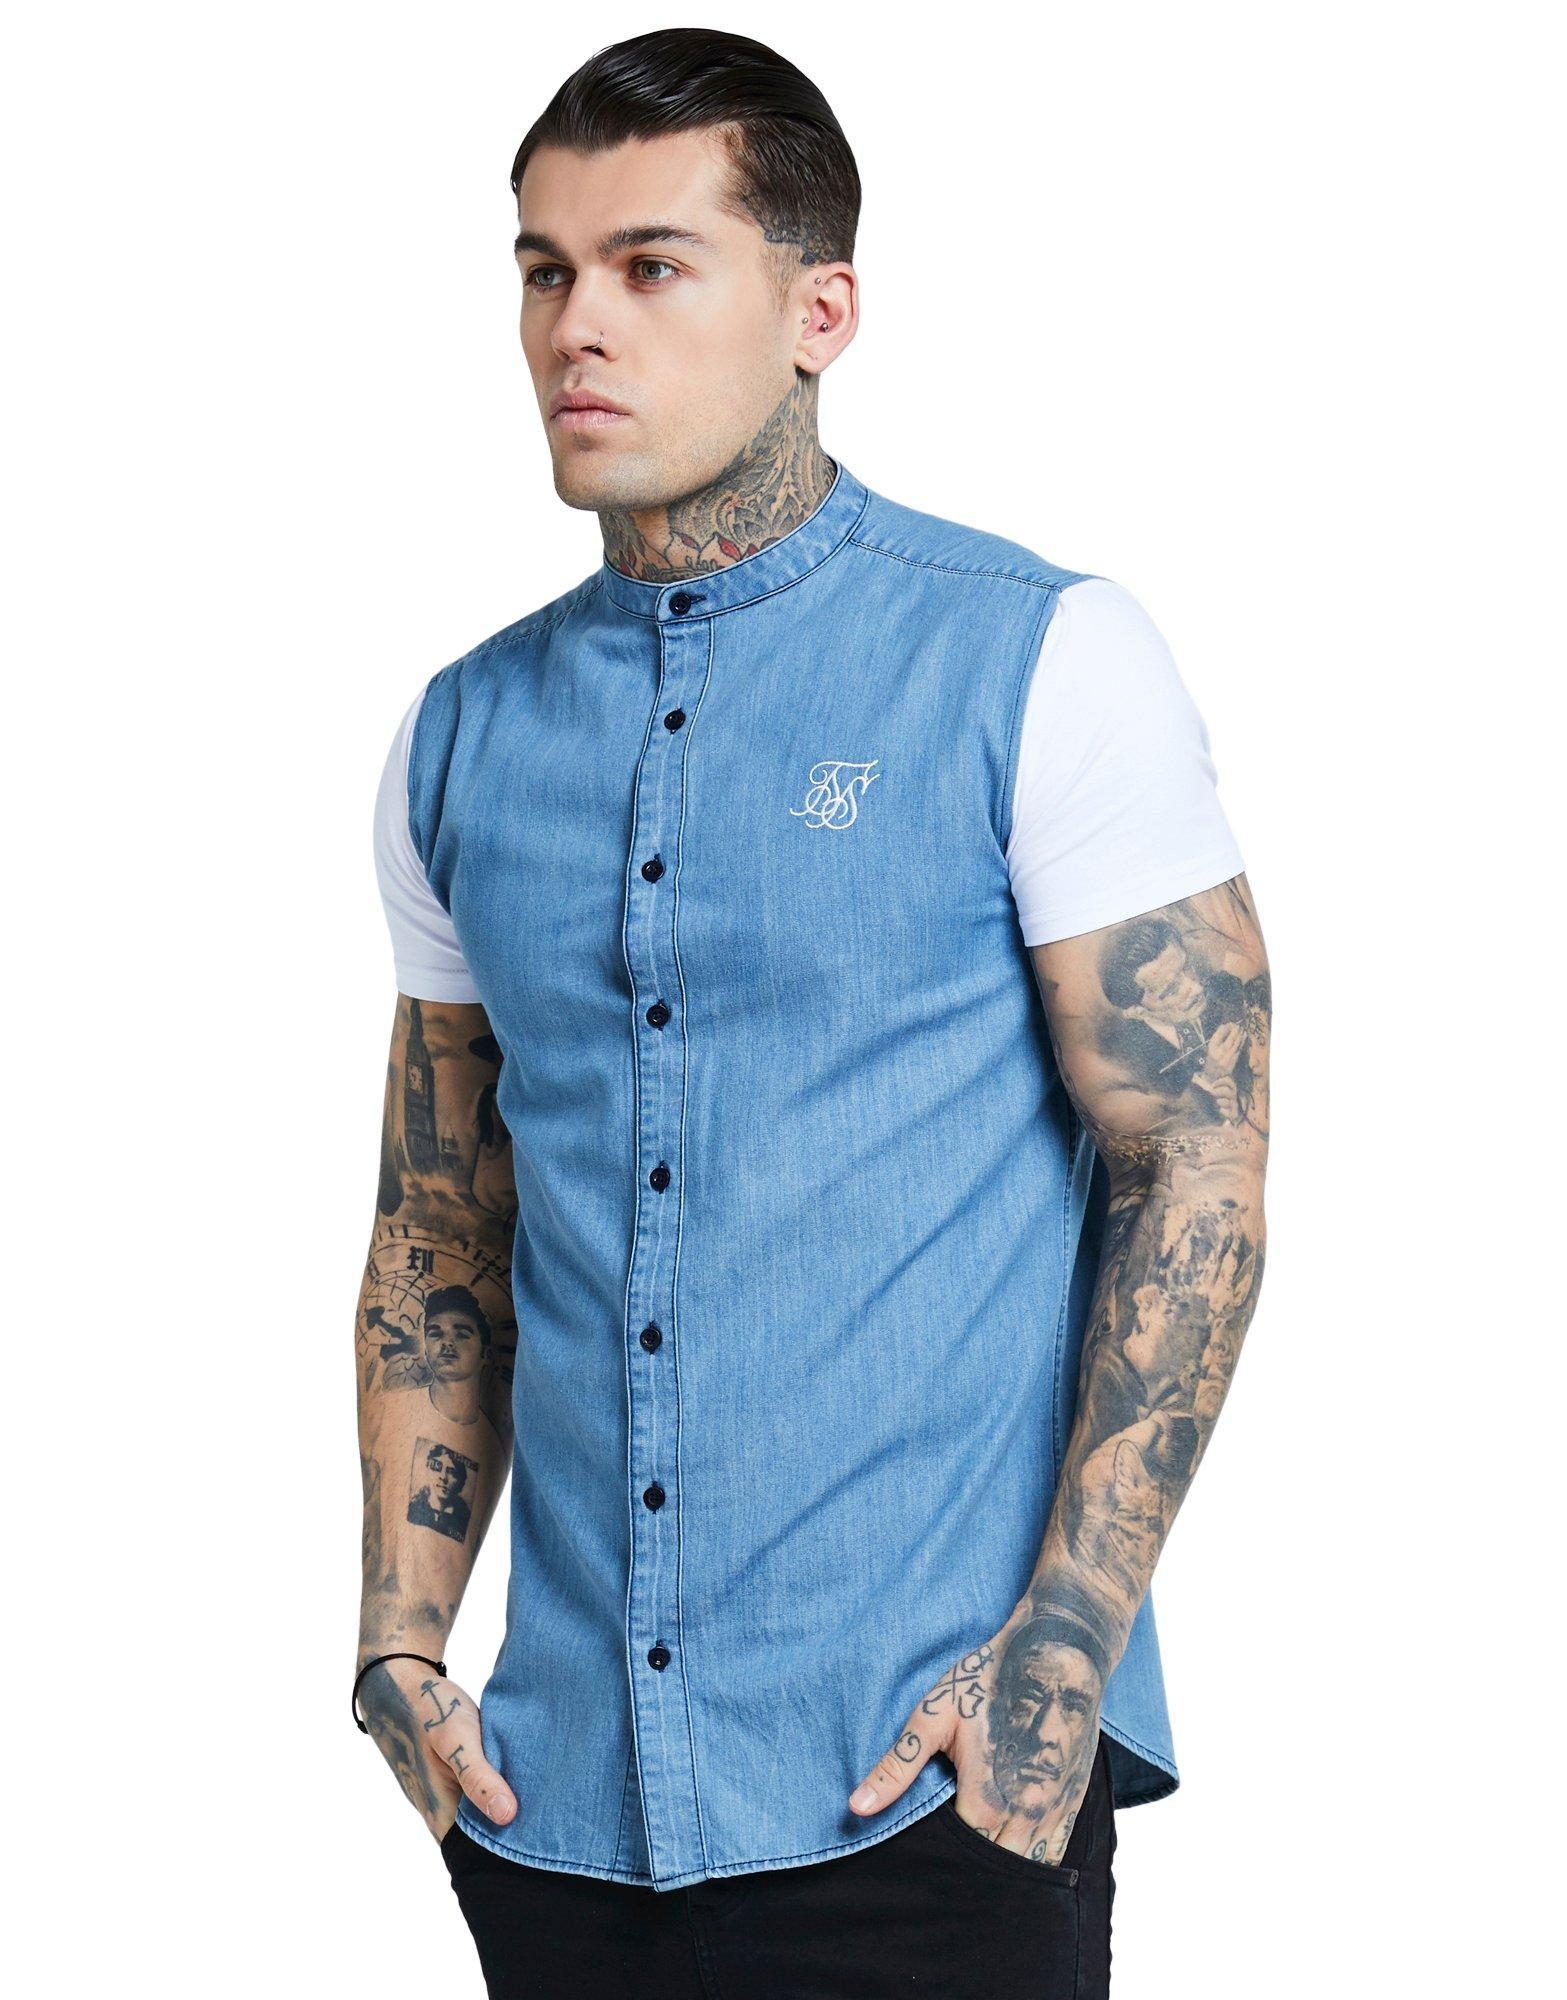 9a6ce0fdb SIKSILK Mid Denim Short Sleeve Shirt in Blue for Men - Lyst